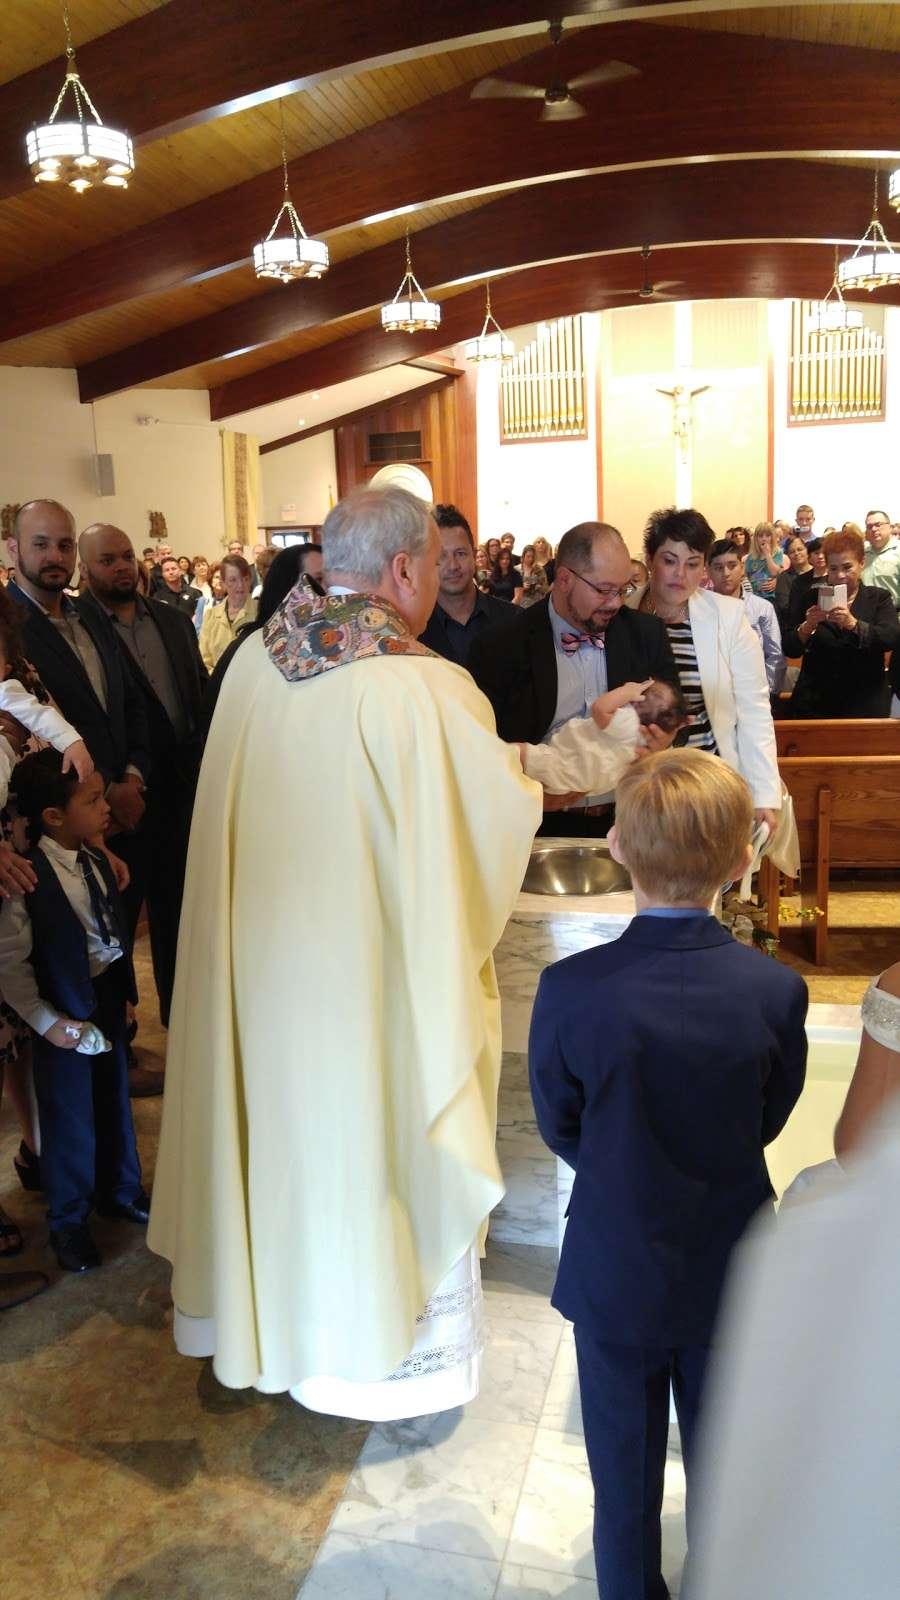 St. Margarets of Cortona Church - church  | Photo 8 of 10 | Address: 31 Chamberlain Ave, Little Ferry, NJ 07643, USA | Phone: (201) 641-2988